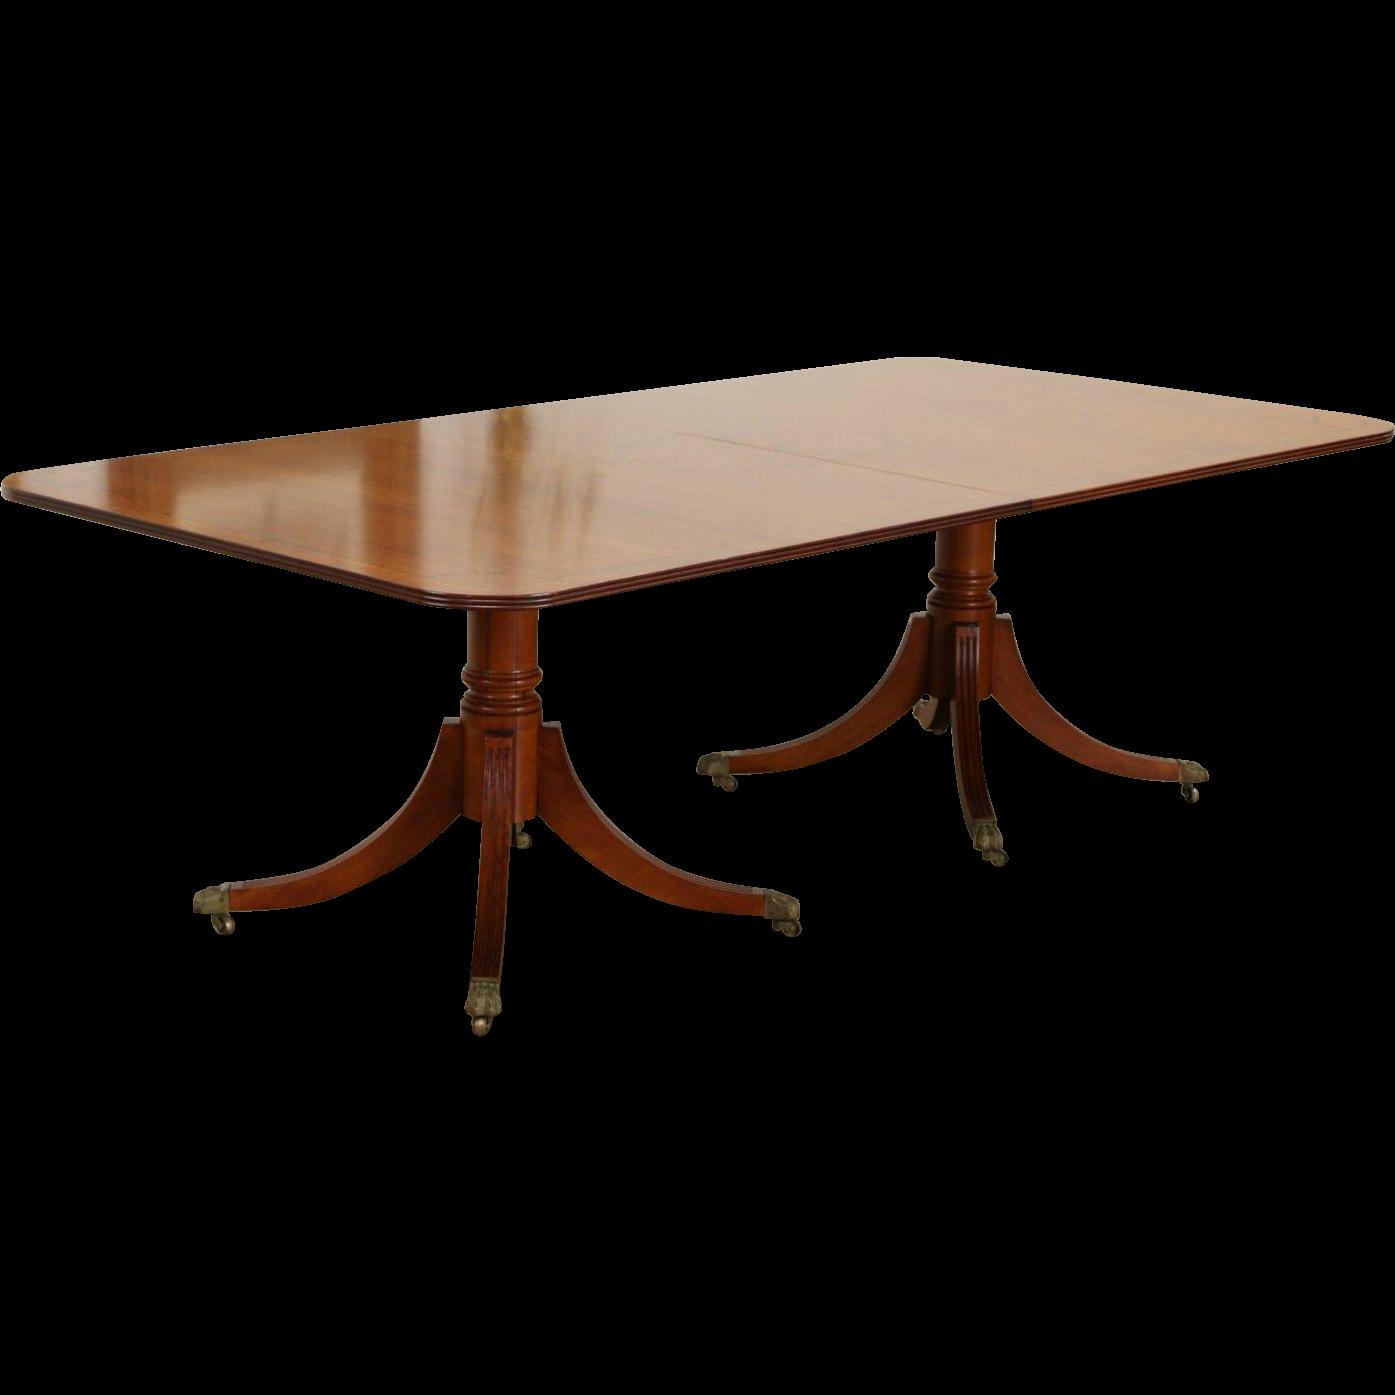 Dining Table, Vintage Primavera 12' Banded & Marquetry, 2 Pedestals